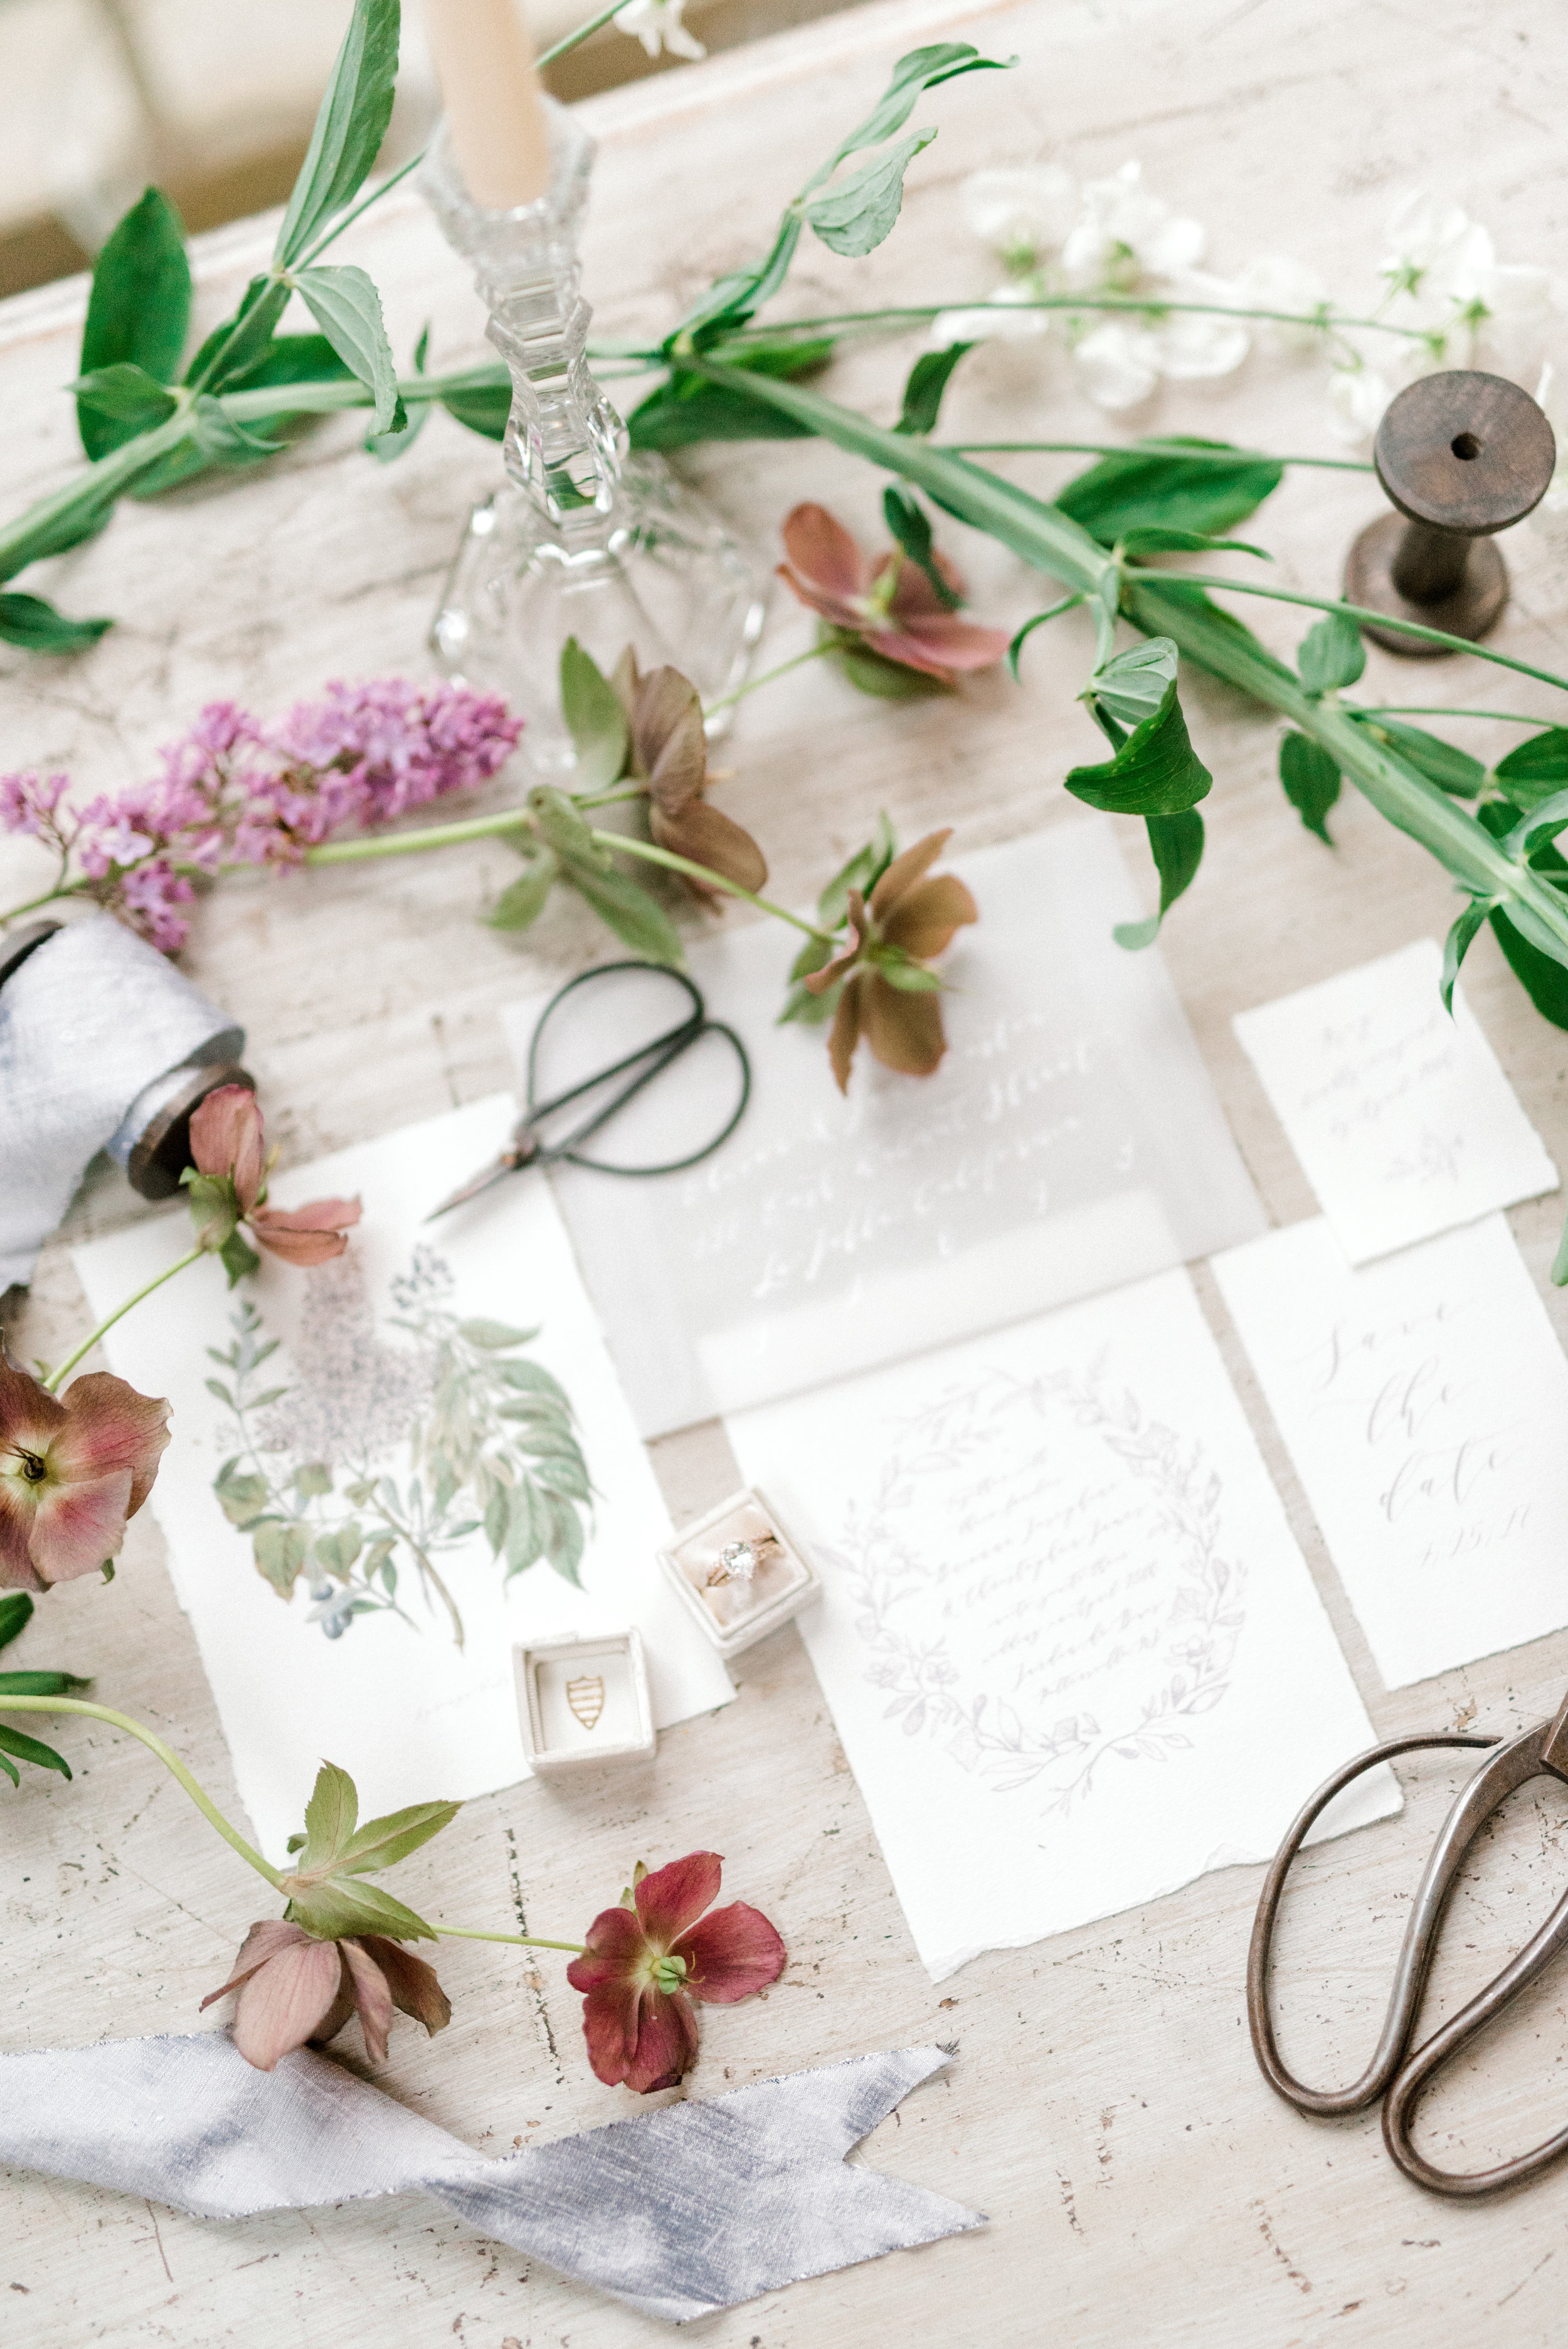 haley-richter-photography-jardin-de-buis-wedding-photos-greenhouse-wedding-bhldn-gown-lilac-wedding-bouquet-beaded-wedding-gown-new-jersey-weddings-garden-wedding-spring-wedding-details-european-inspired-lilac-purple-flowers